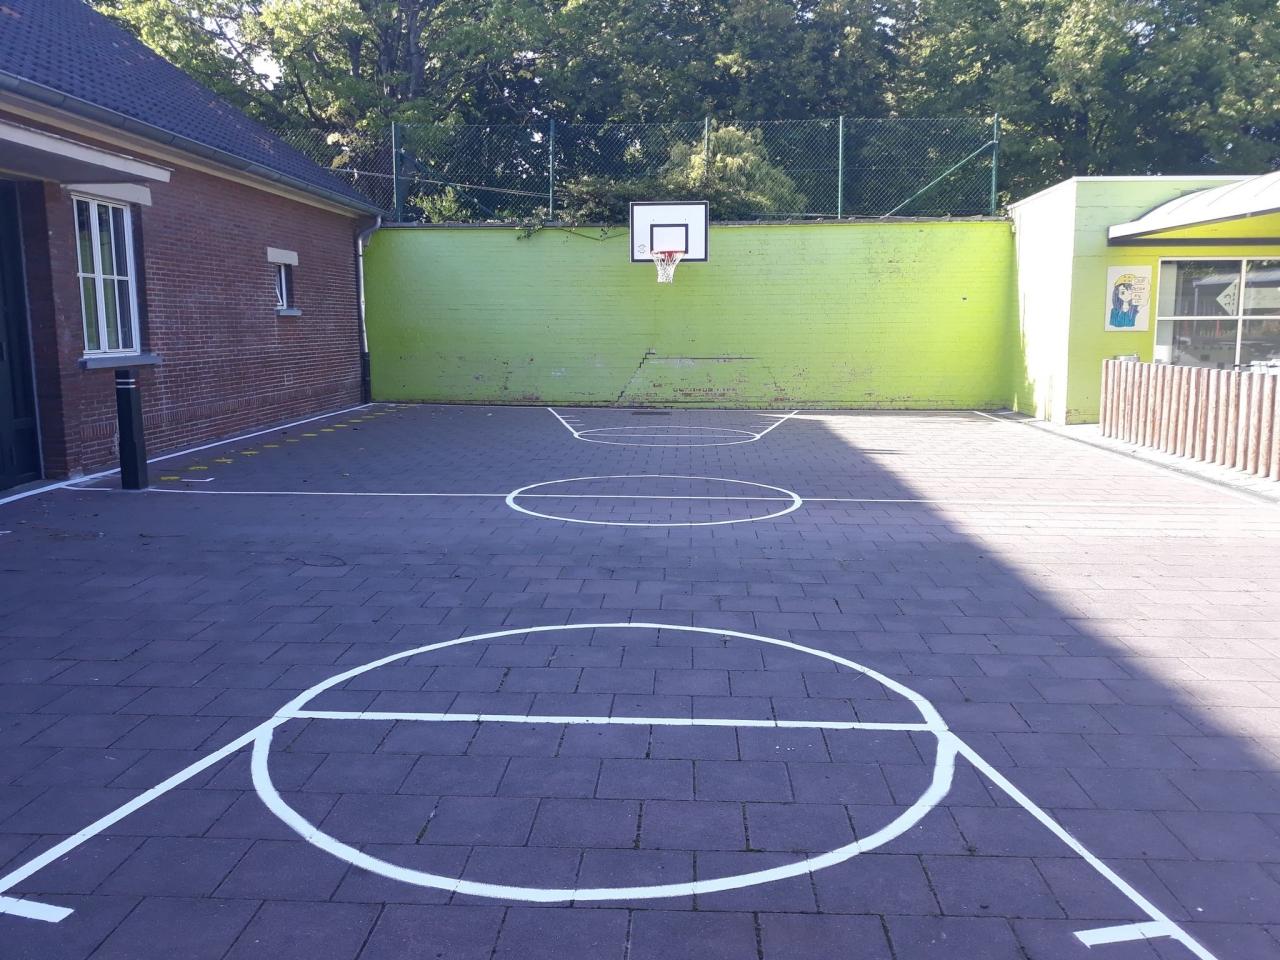 Basketbalplein grote speelplaats